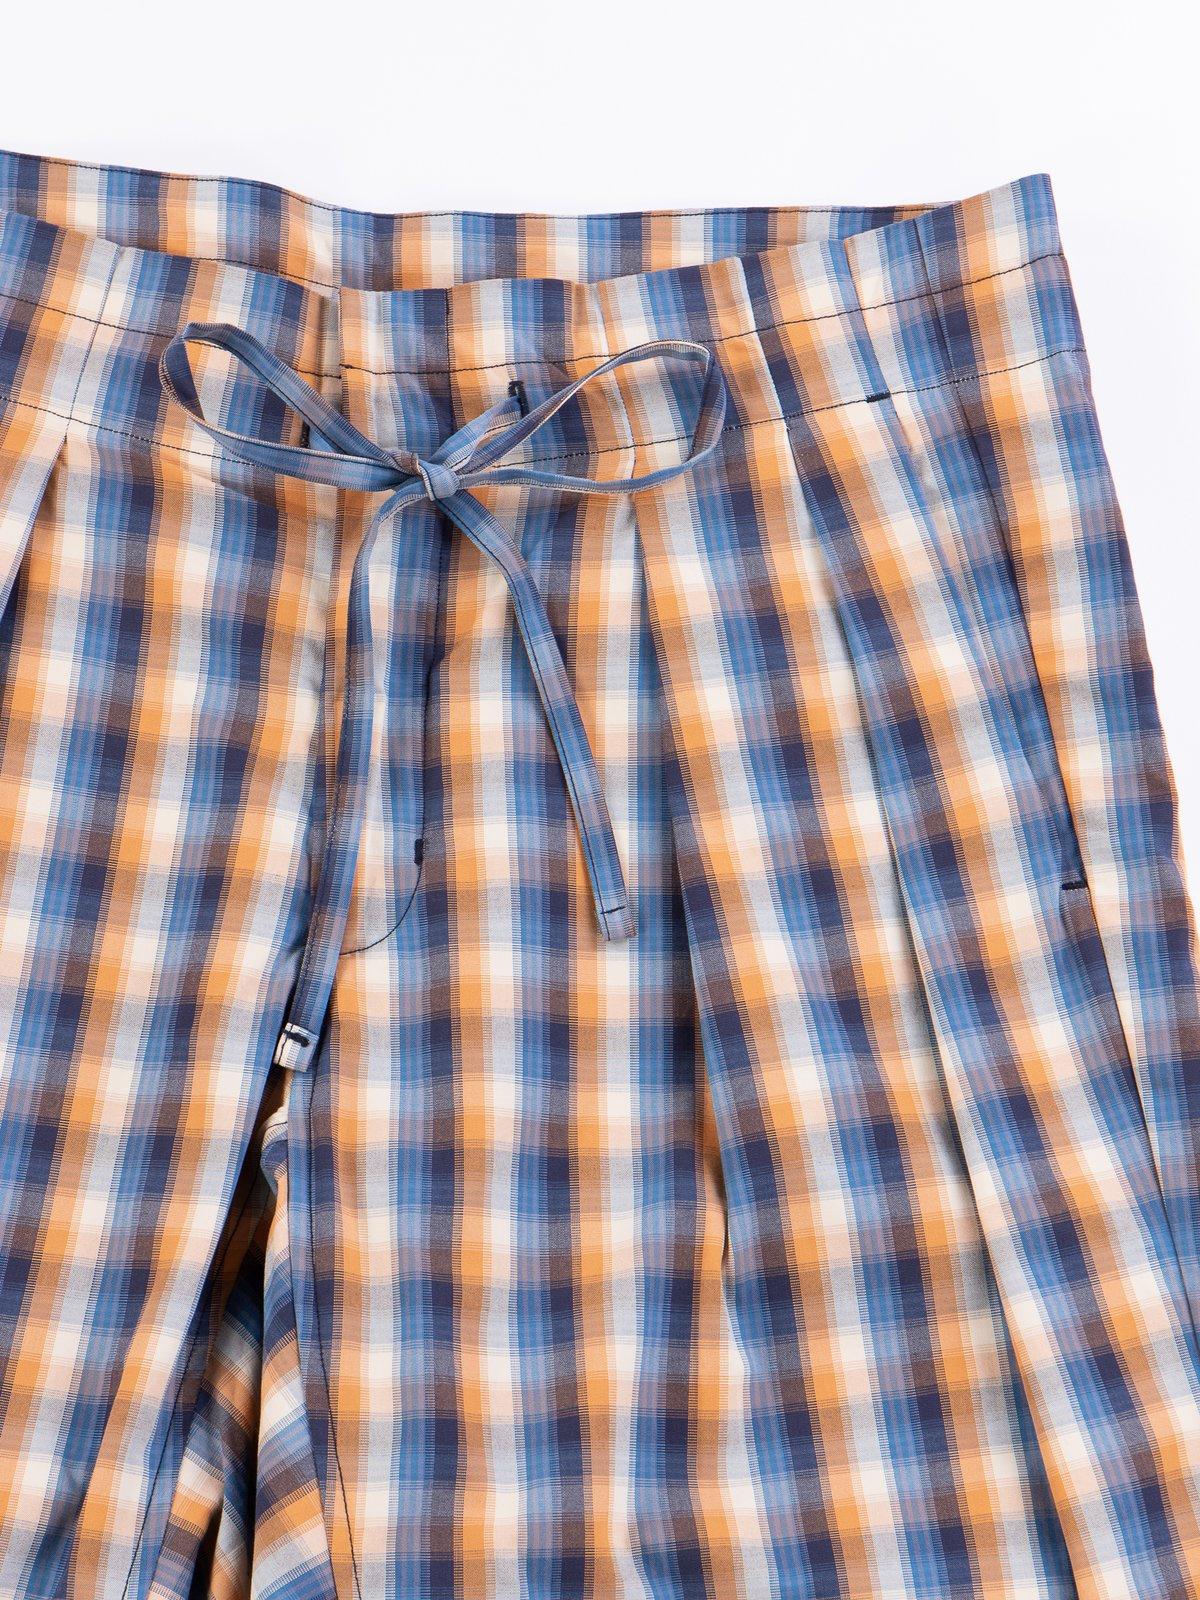 Blue/Orange Plaid Oxford Vancloth Drop Crotch Shorts - Image 3